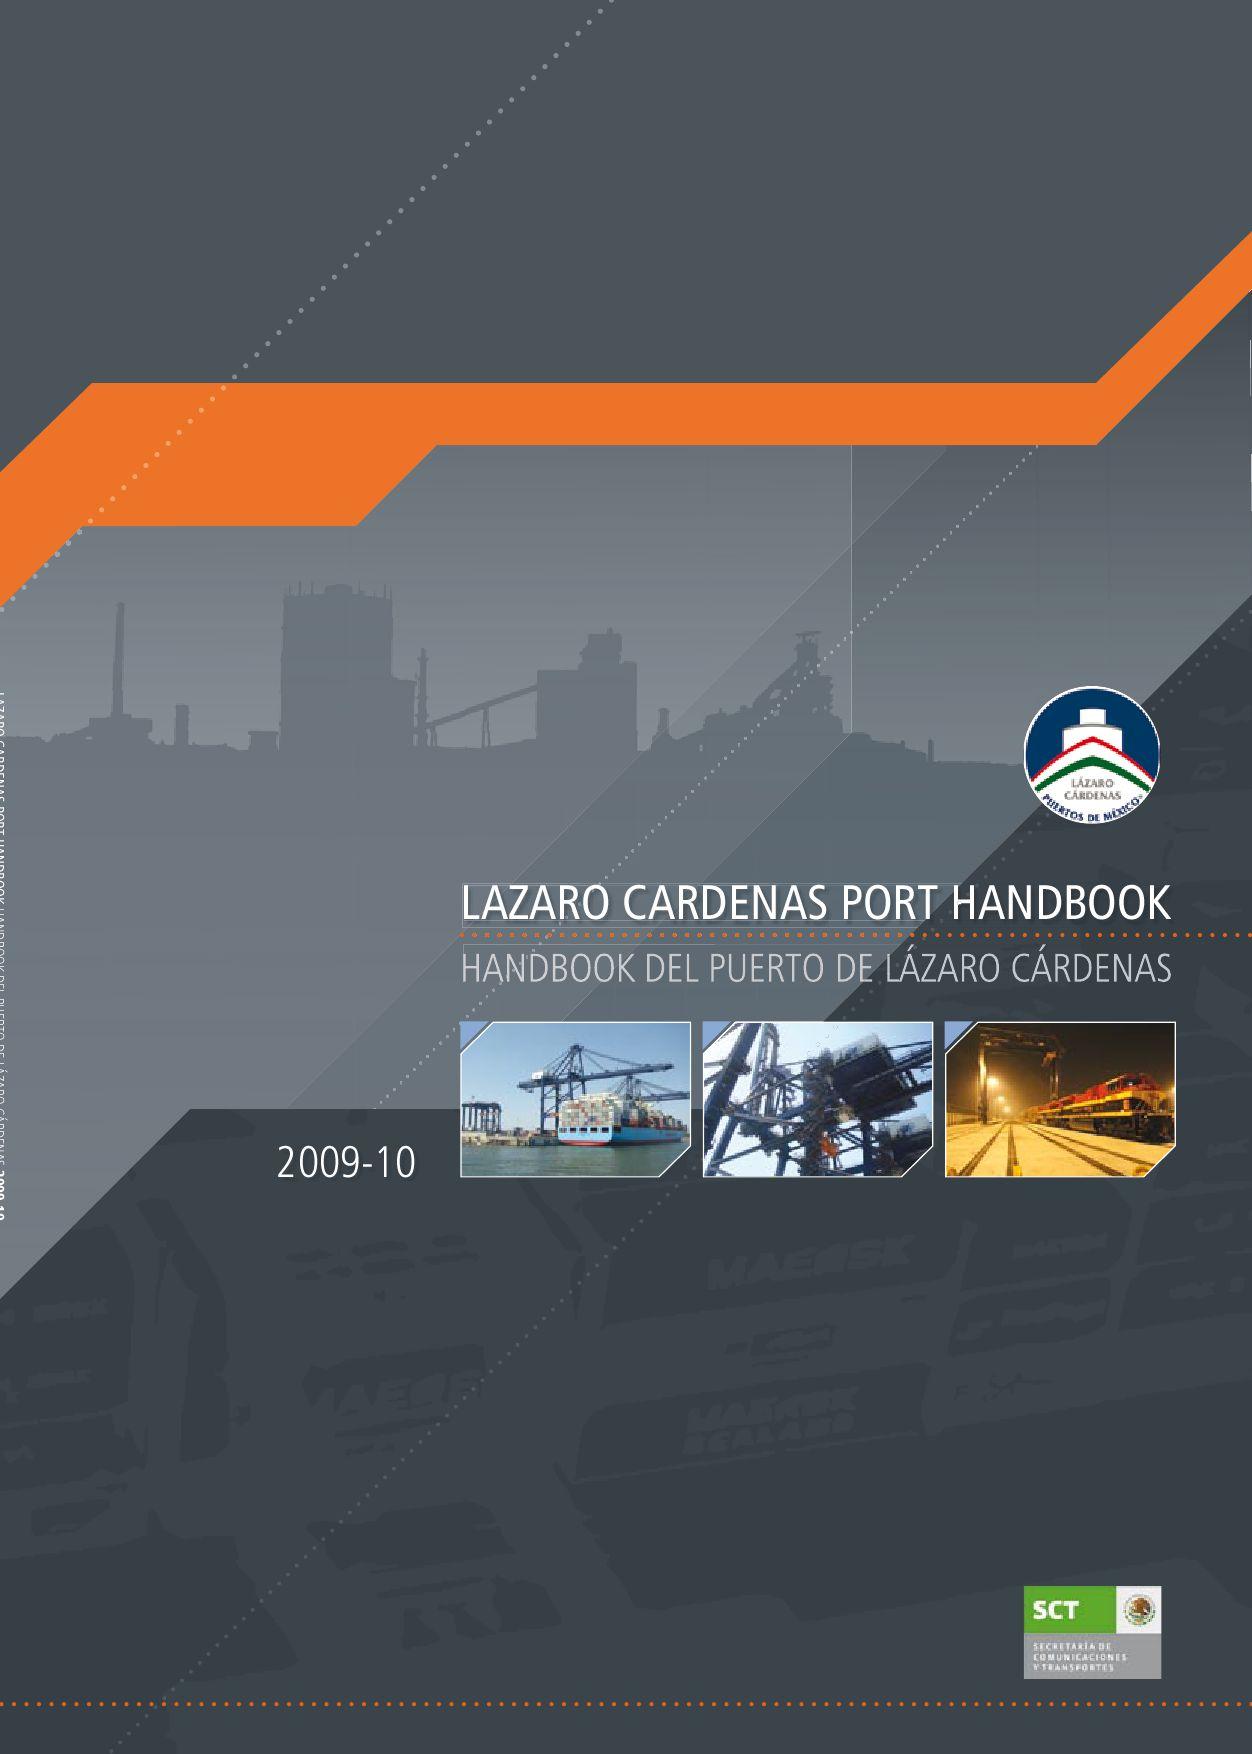 hight resolution of lazaro cardenas port handbook 2009 10 by land marine publications ltd issuu